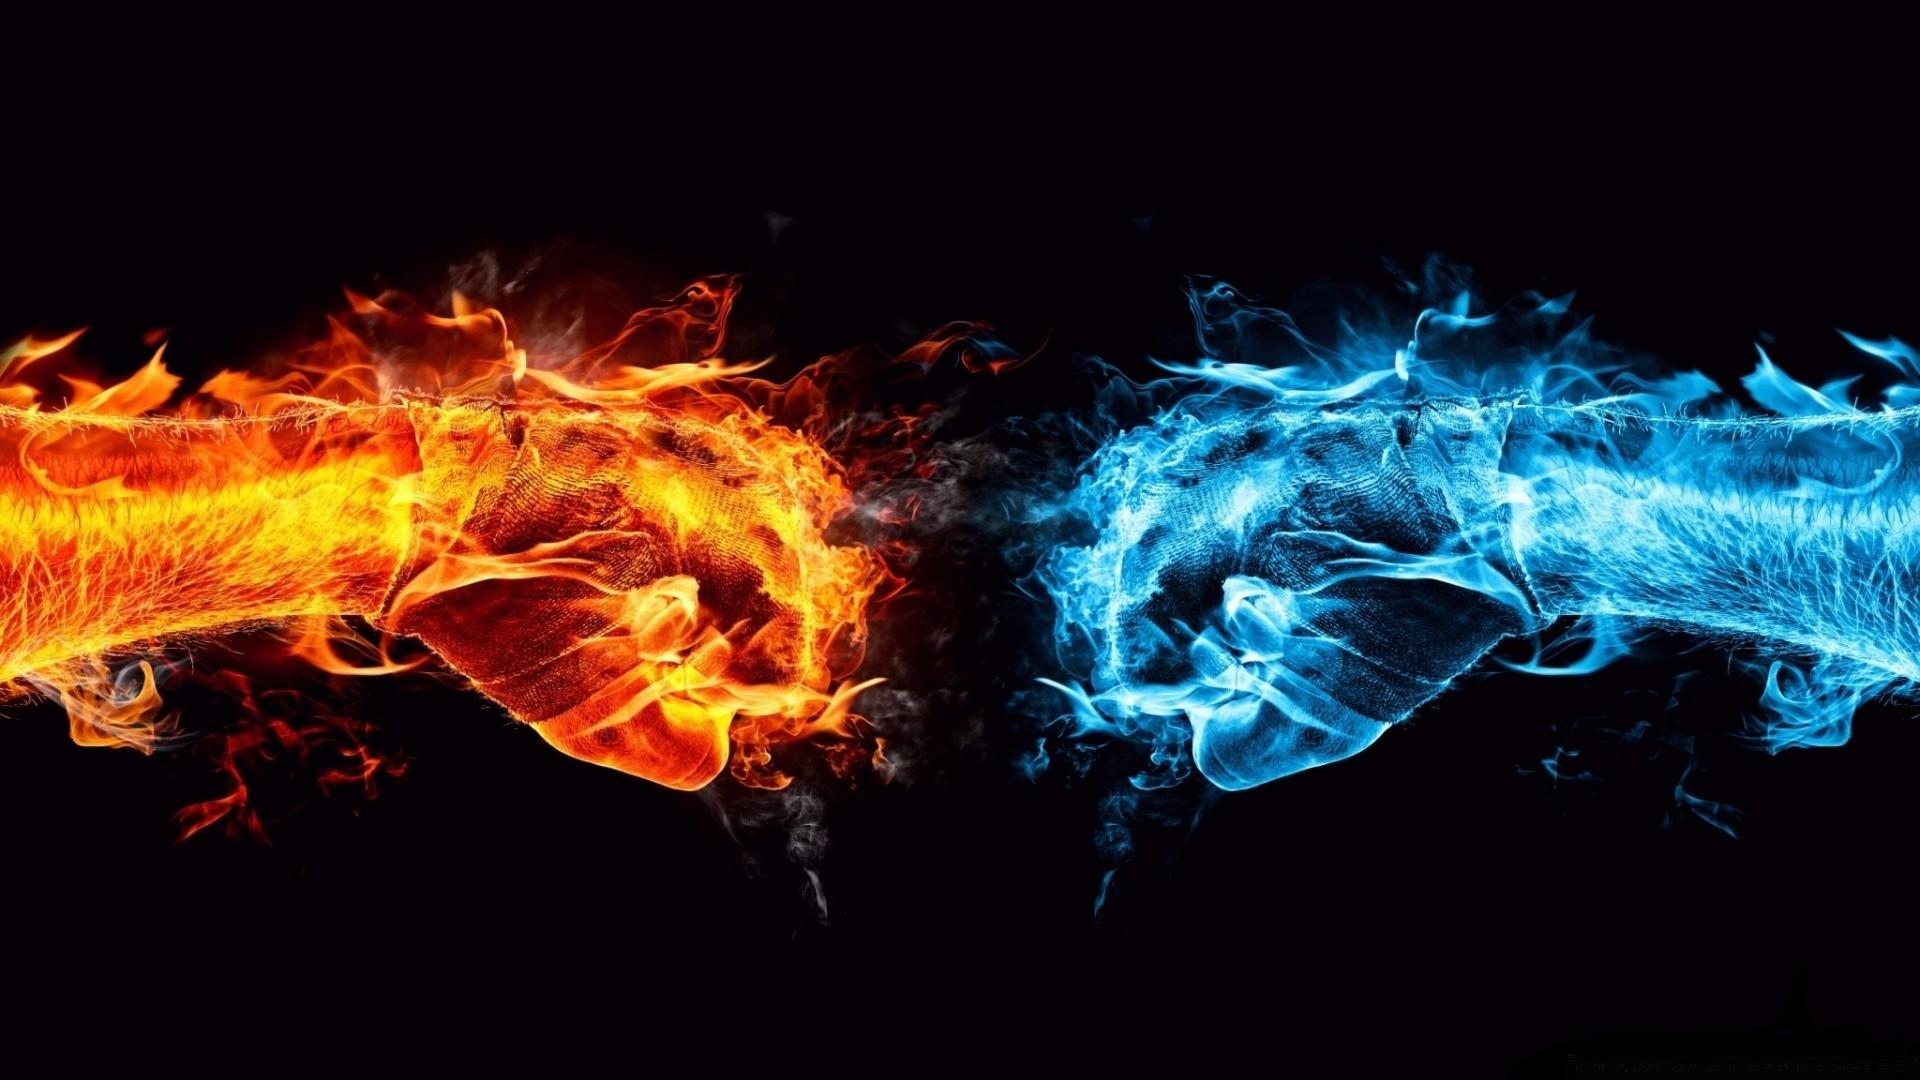 Fire And Ice hd desktop wallpaper